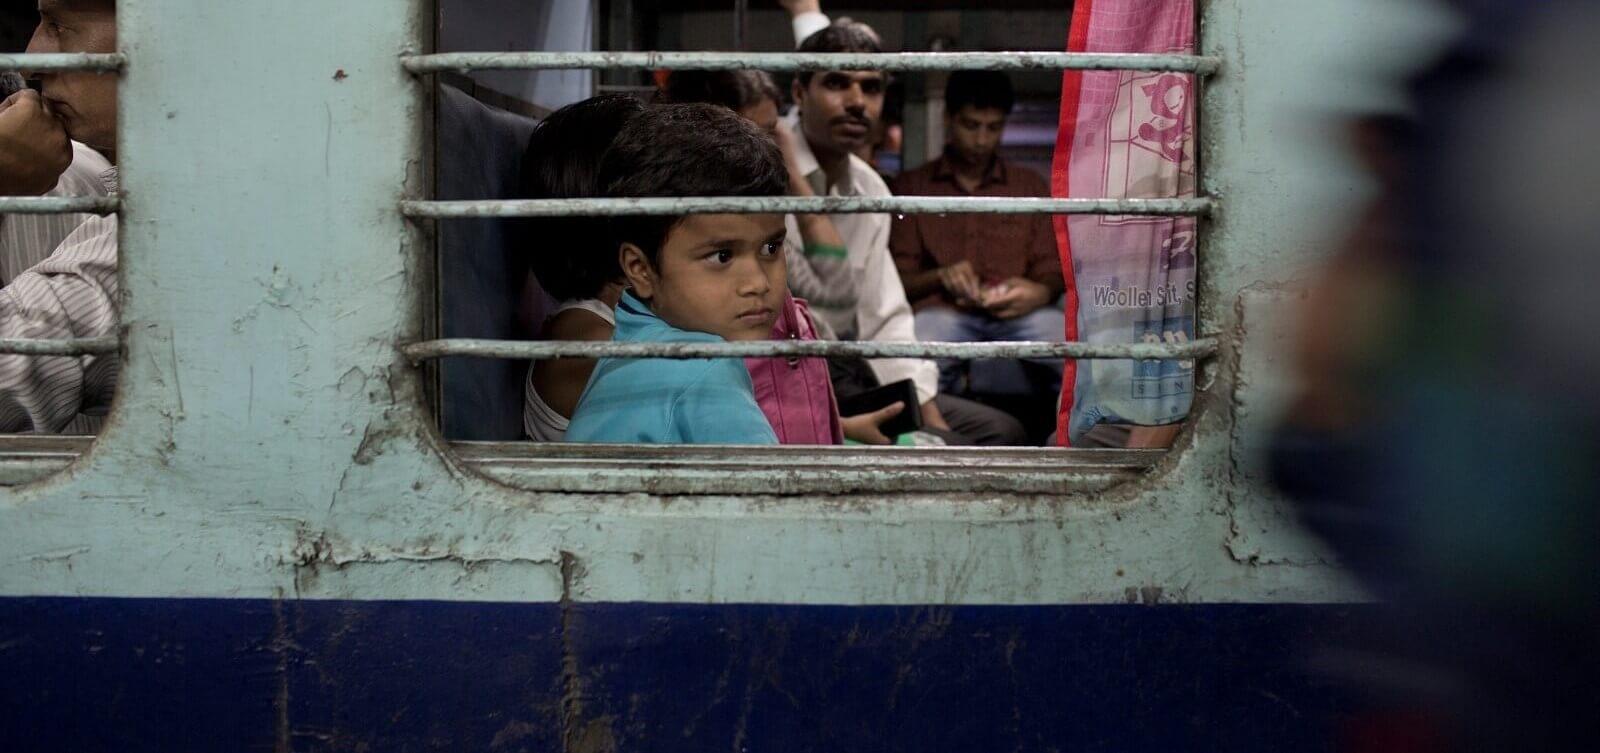 Photo: Dhiraj Singh/UNDP India/Flickr